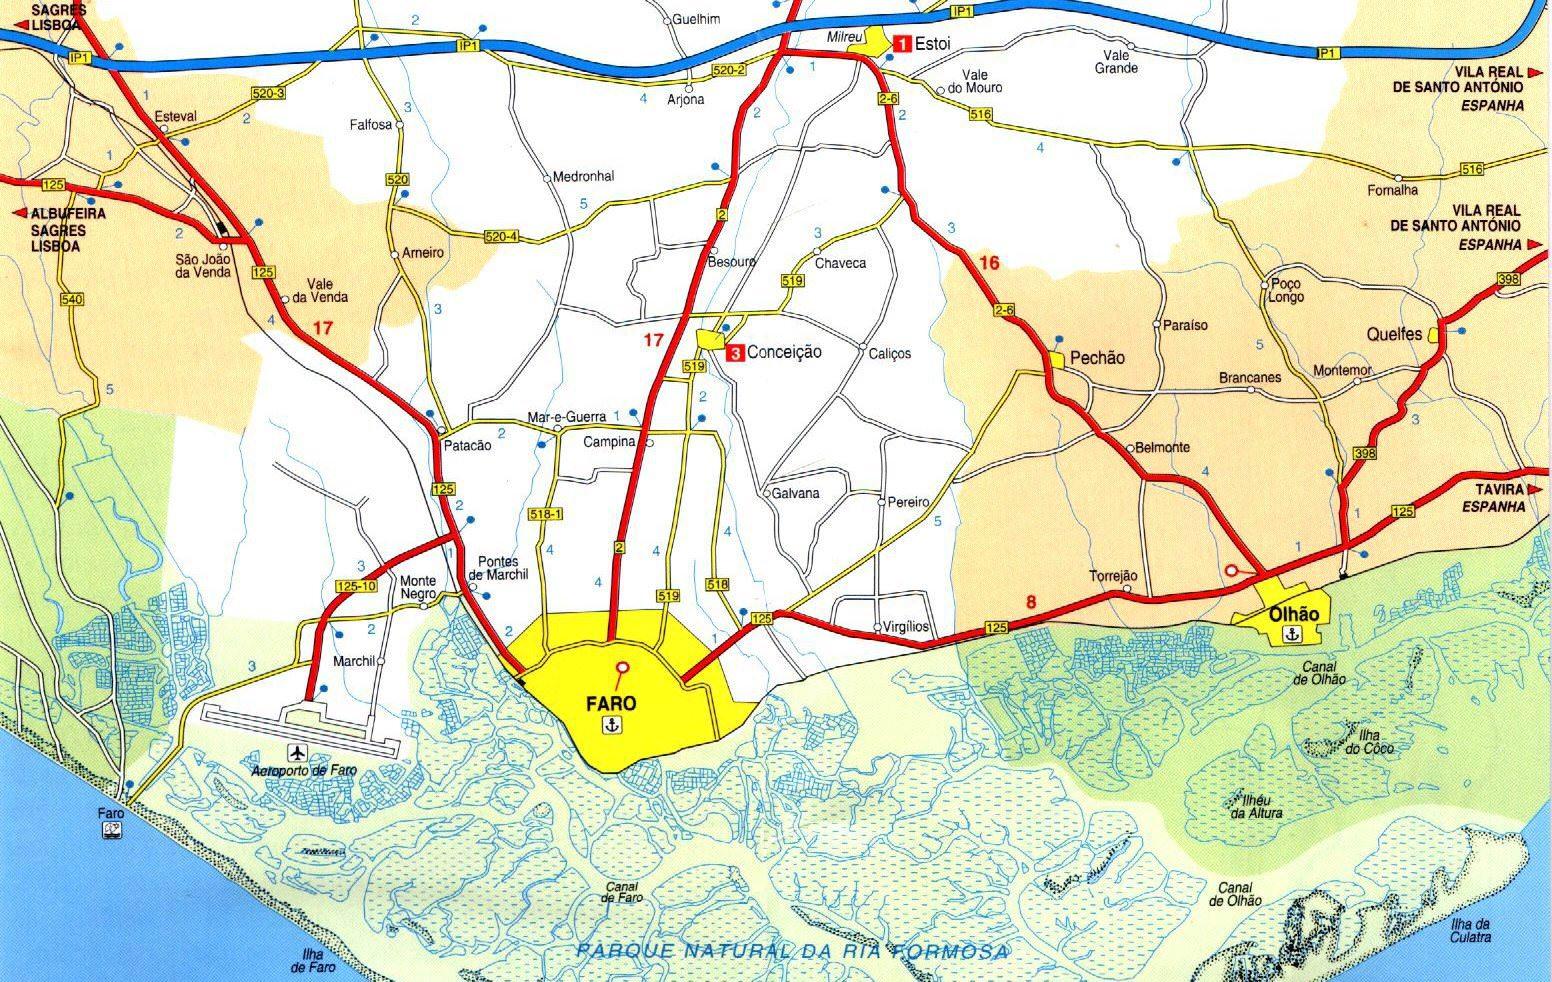 Faro-Airport-Algarve-Map